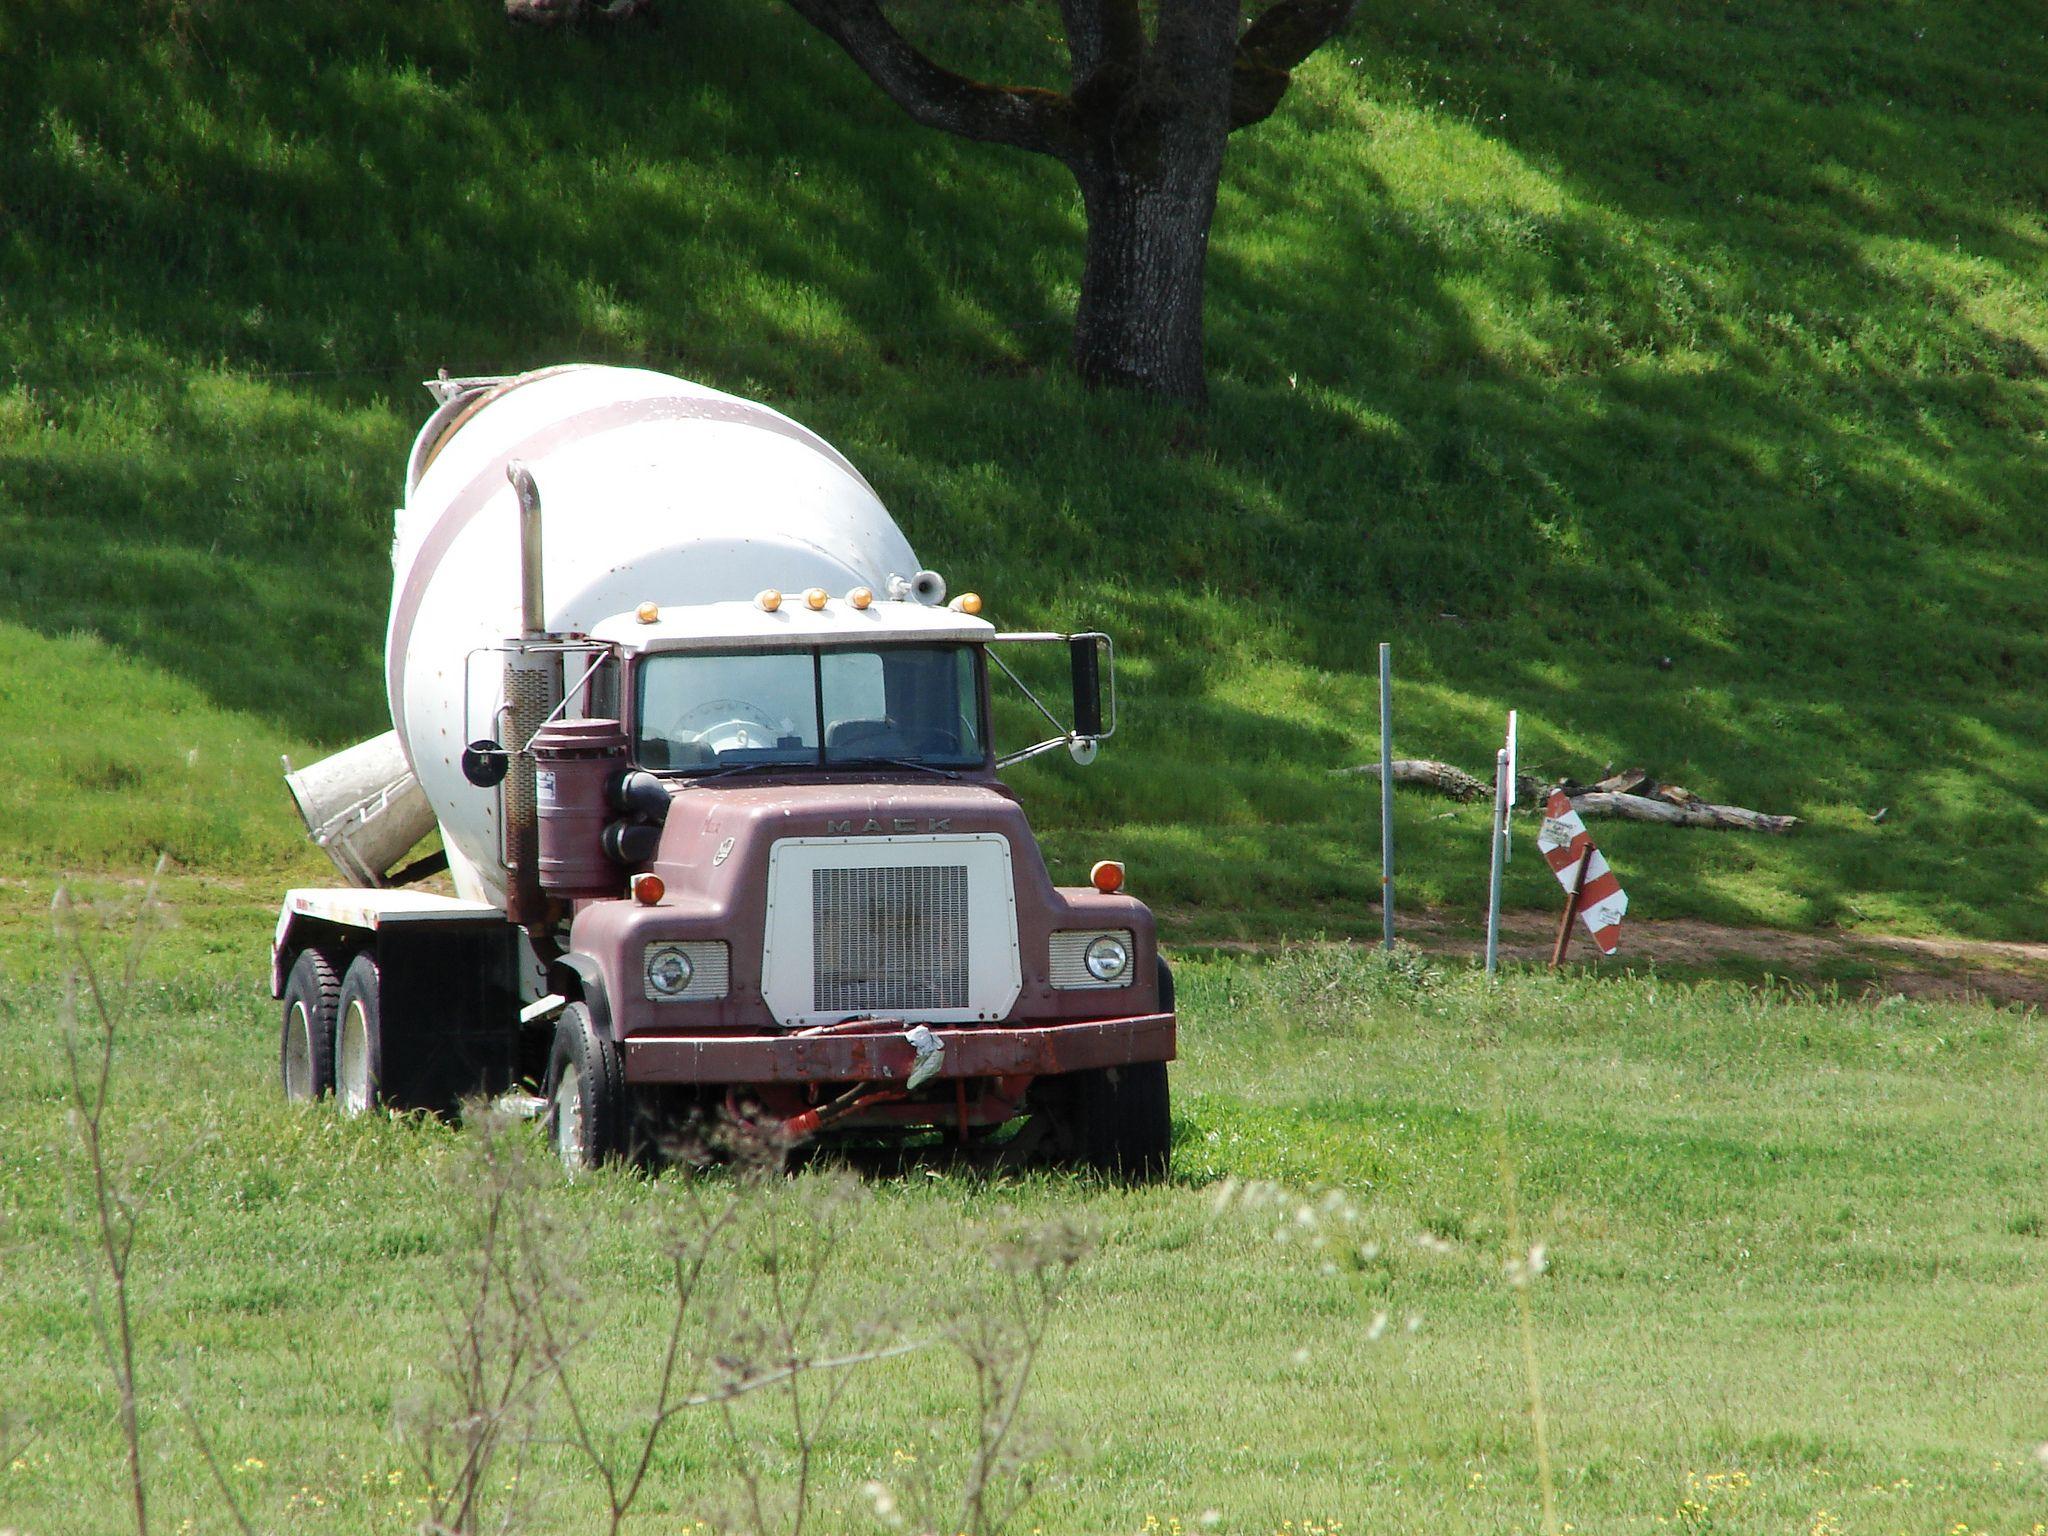 All Sizes Vintage Mack Truck Cement Mixer Flickr Photo Sharing Mack Trucks Cement Mixers Concrete Truck